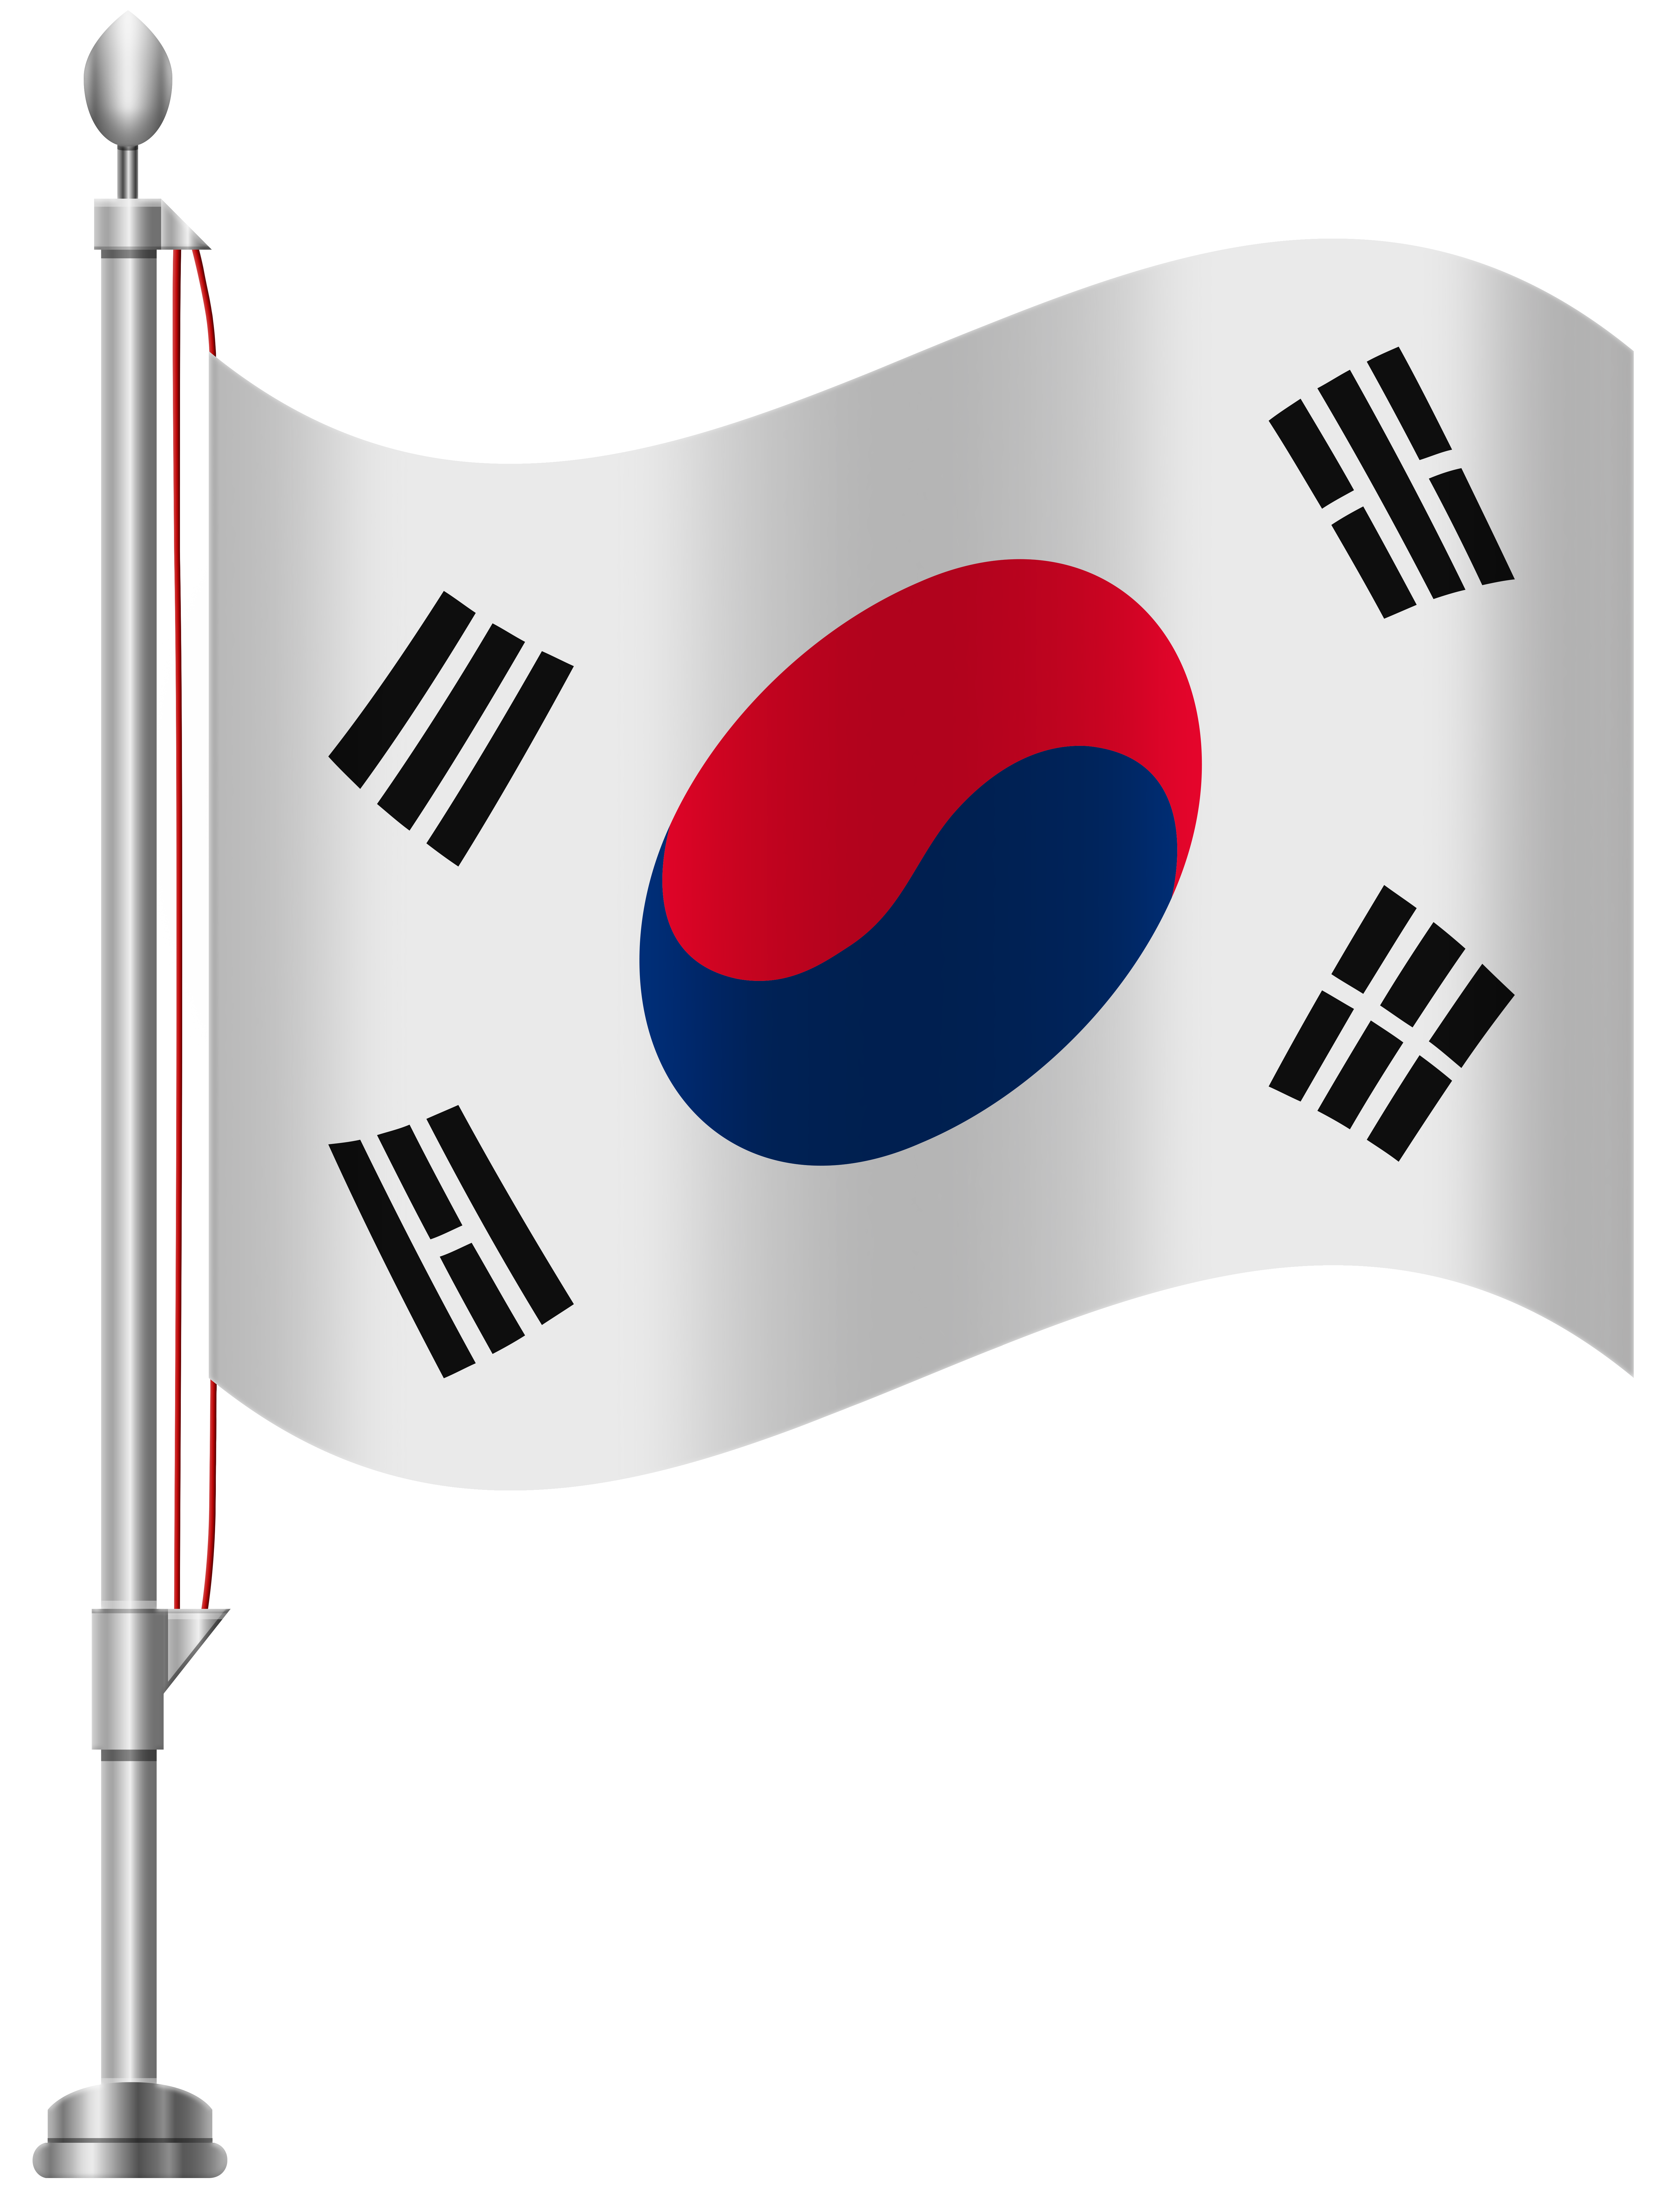 South korea clipart royalty free stock South Korea Flag PNG Clip Art - Best WEB Clipart royalty free stock